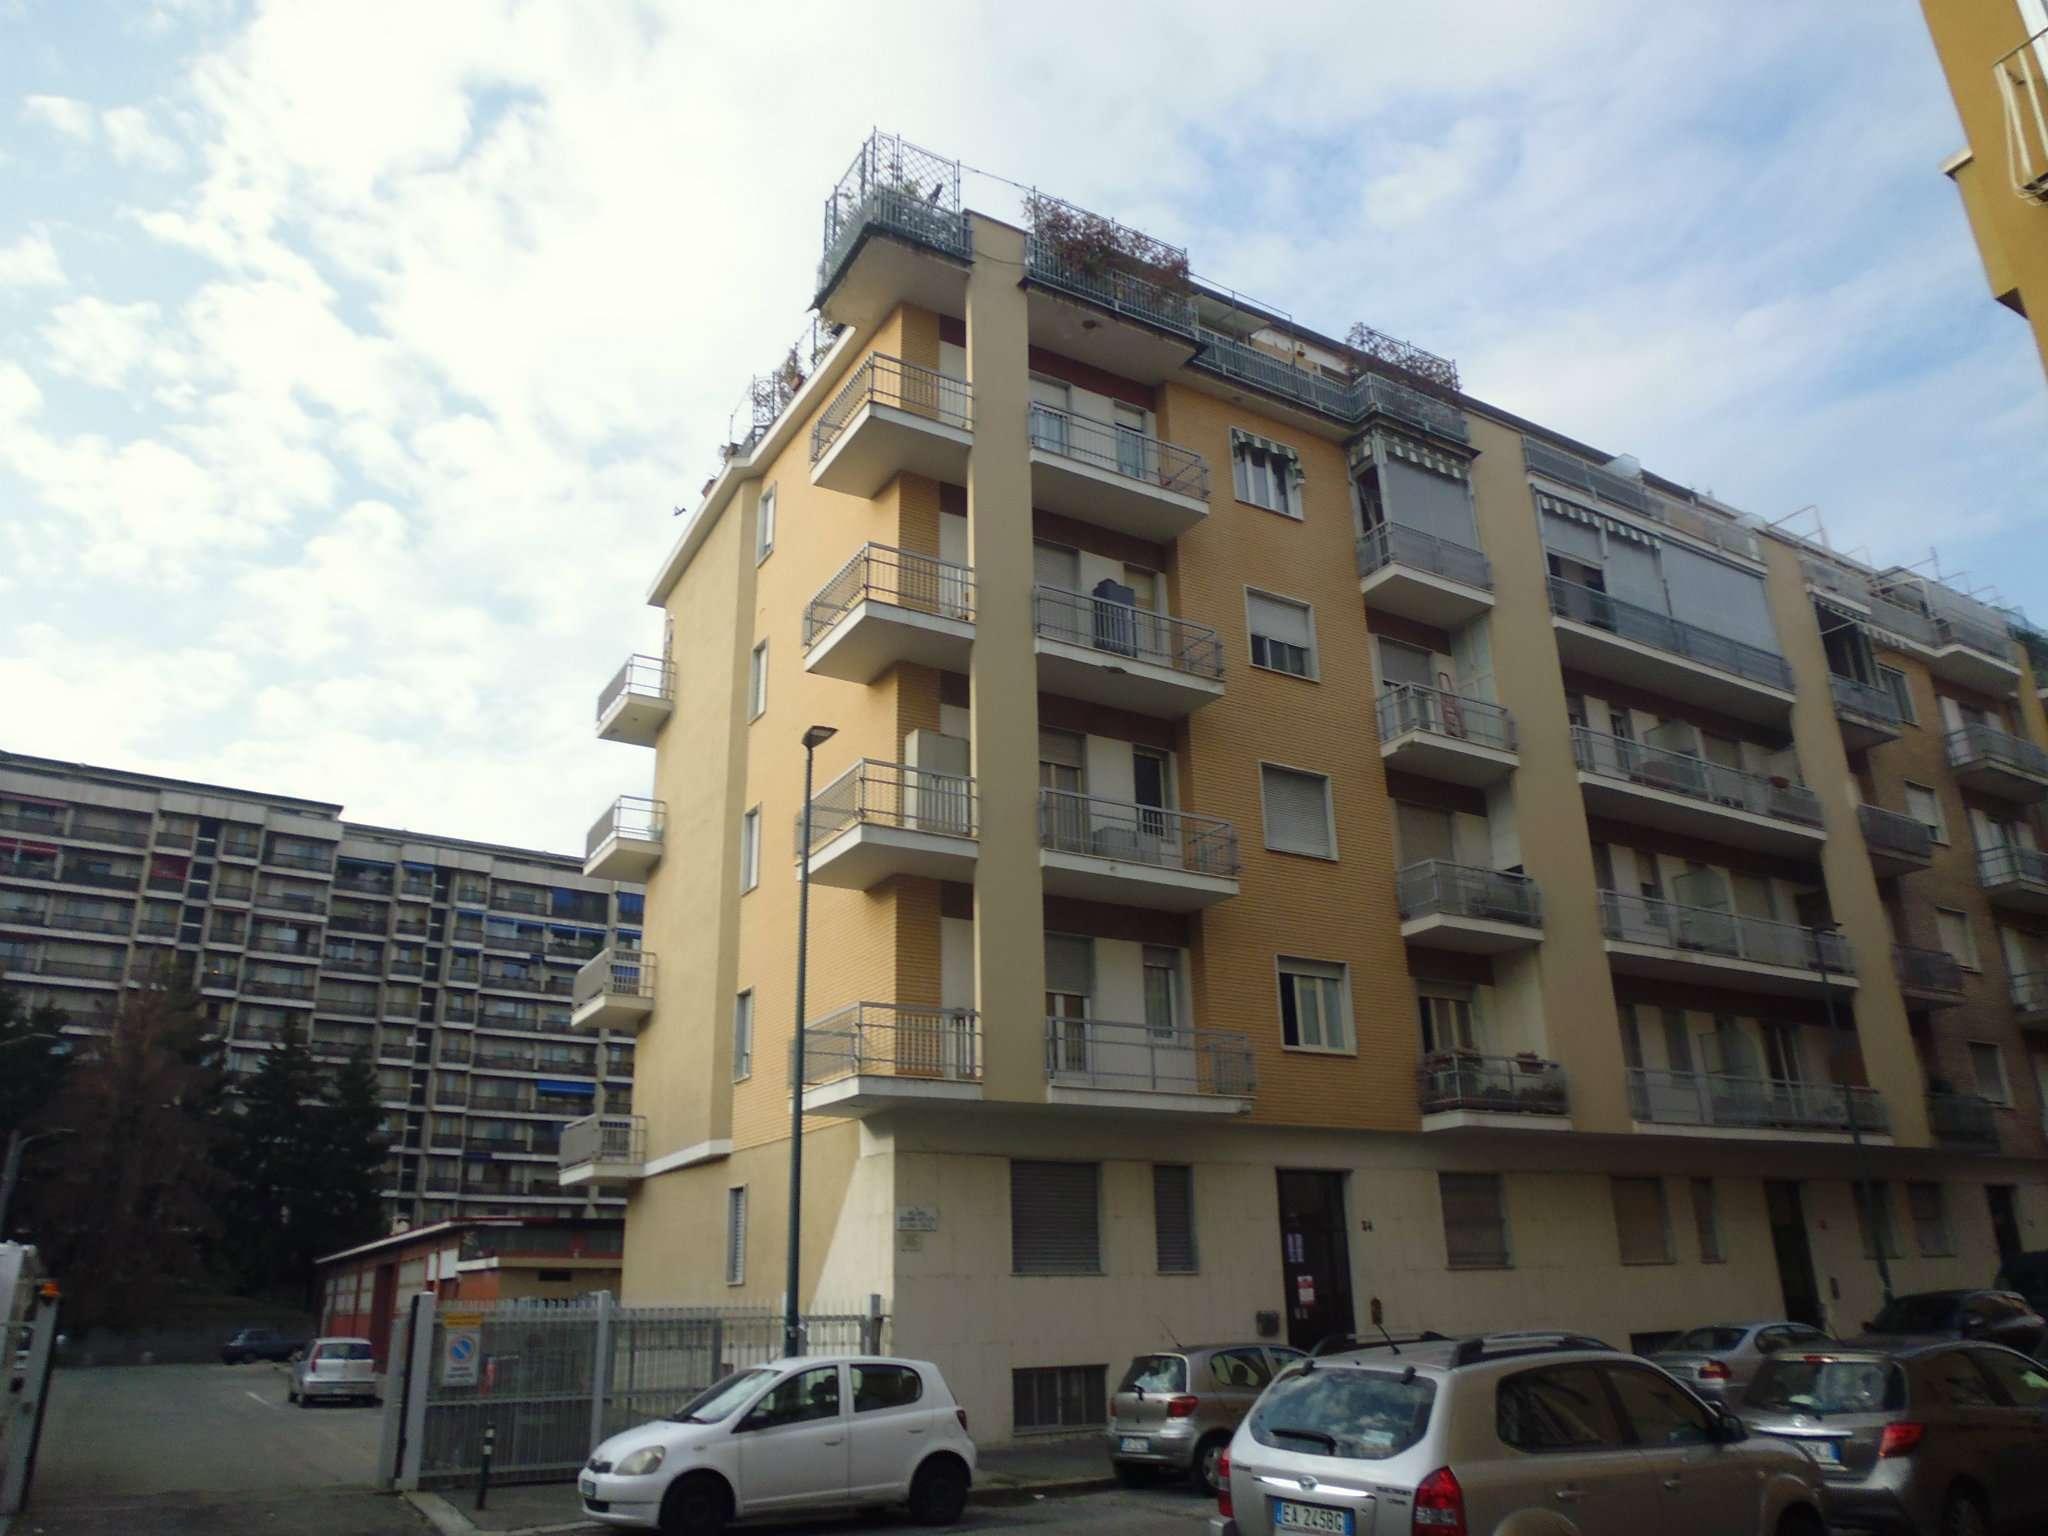 Foto 1 di Bilocale via Biscarra 34, Torino (zona Mirafiori)